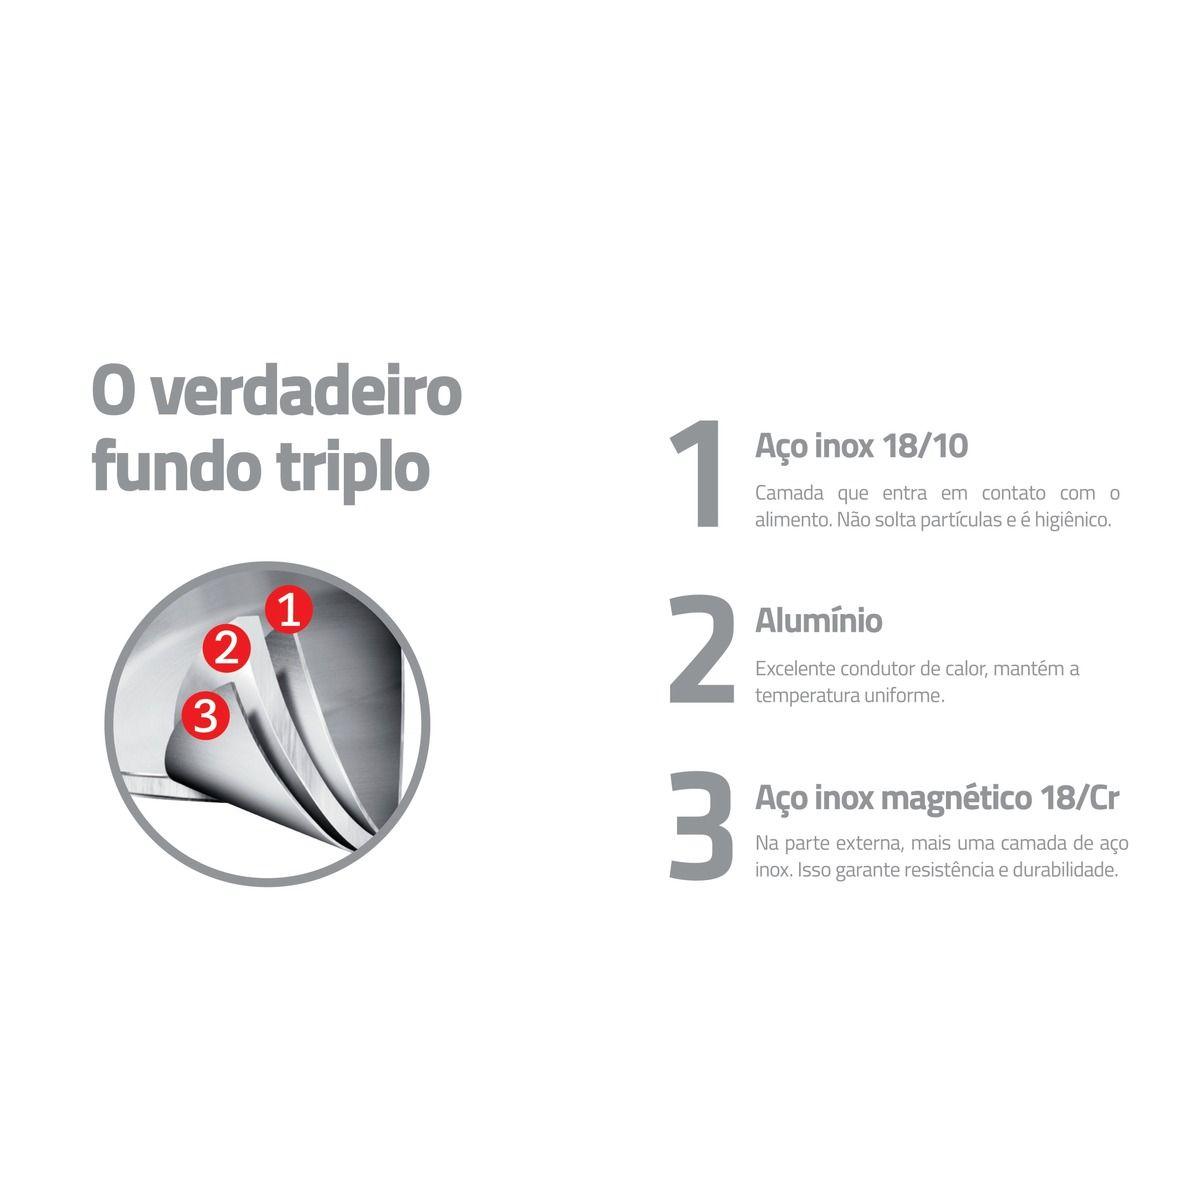 Frigideira Tramontina Inox Fundo Triplo Cerâmica 62635/304